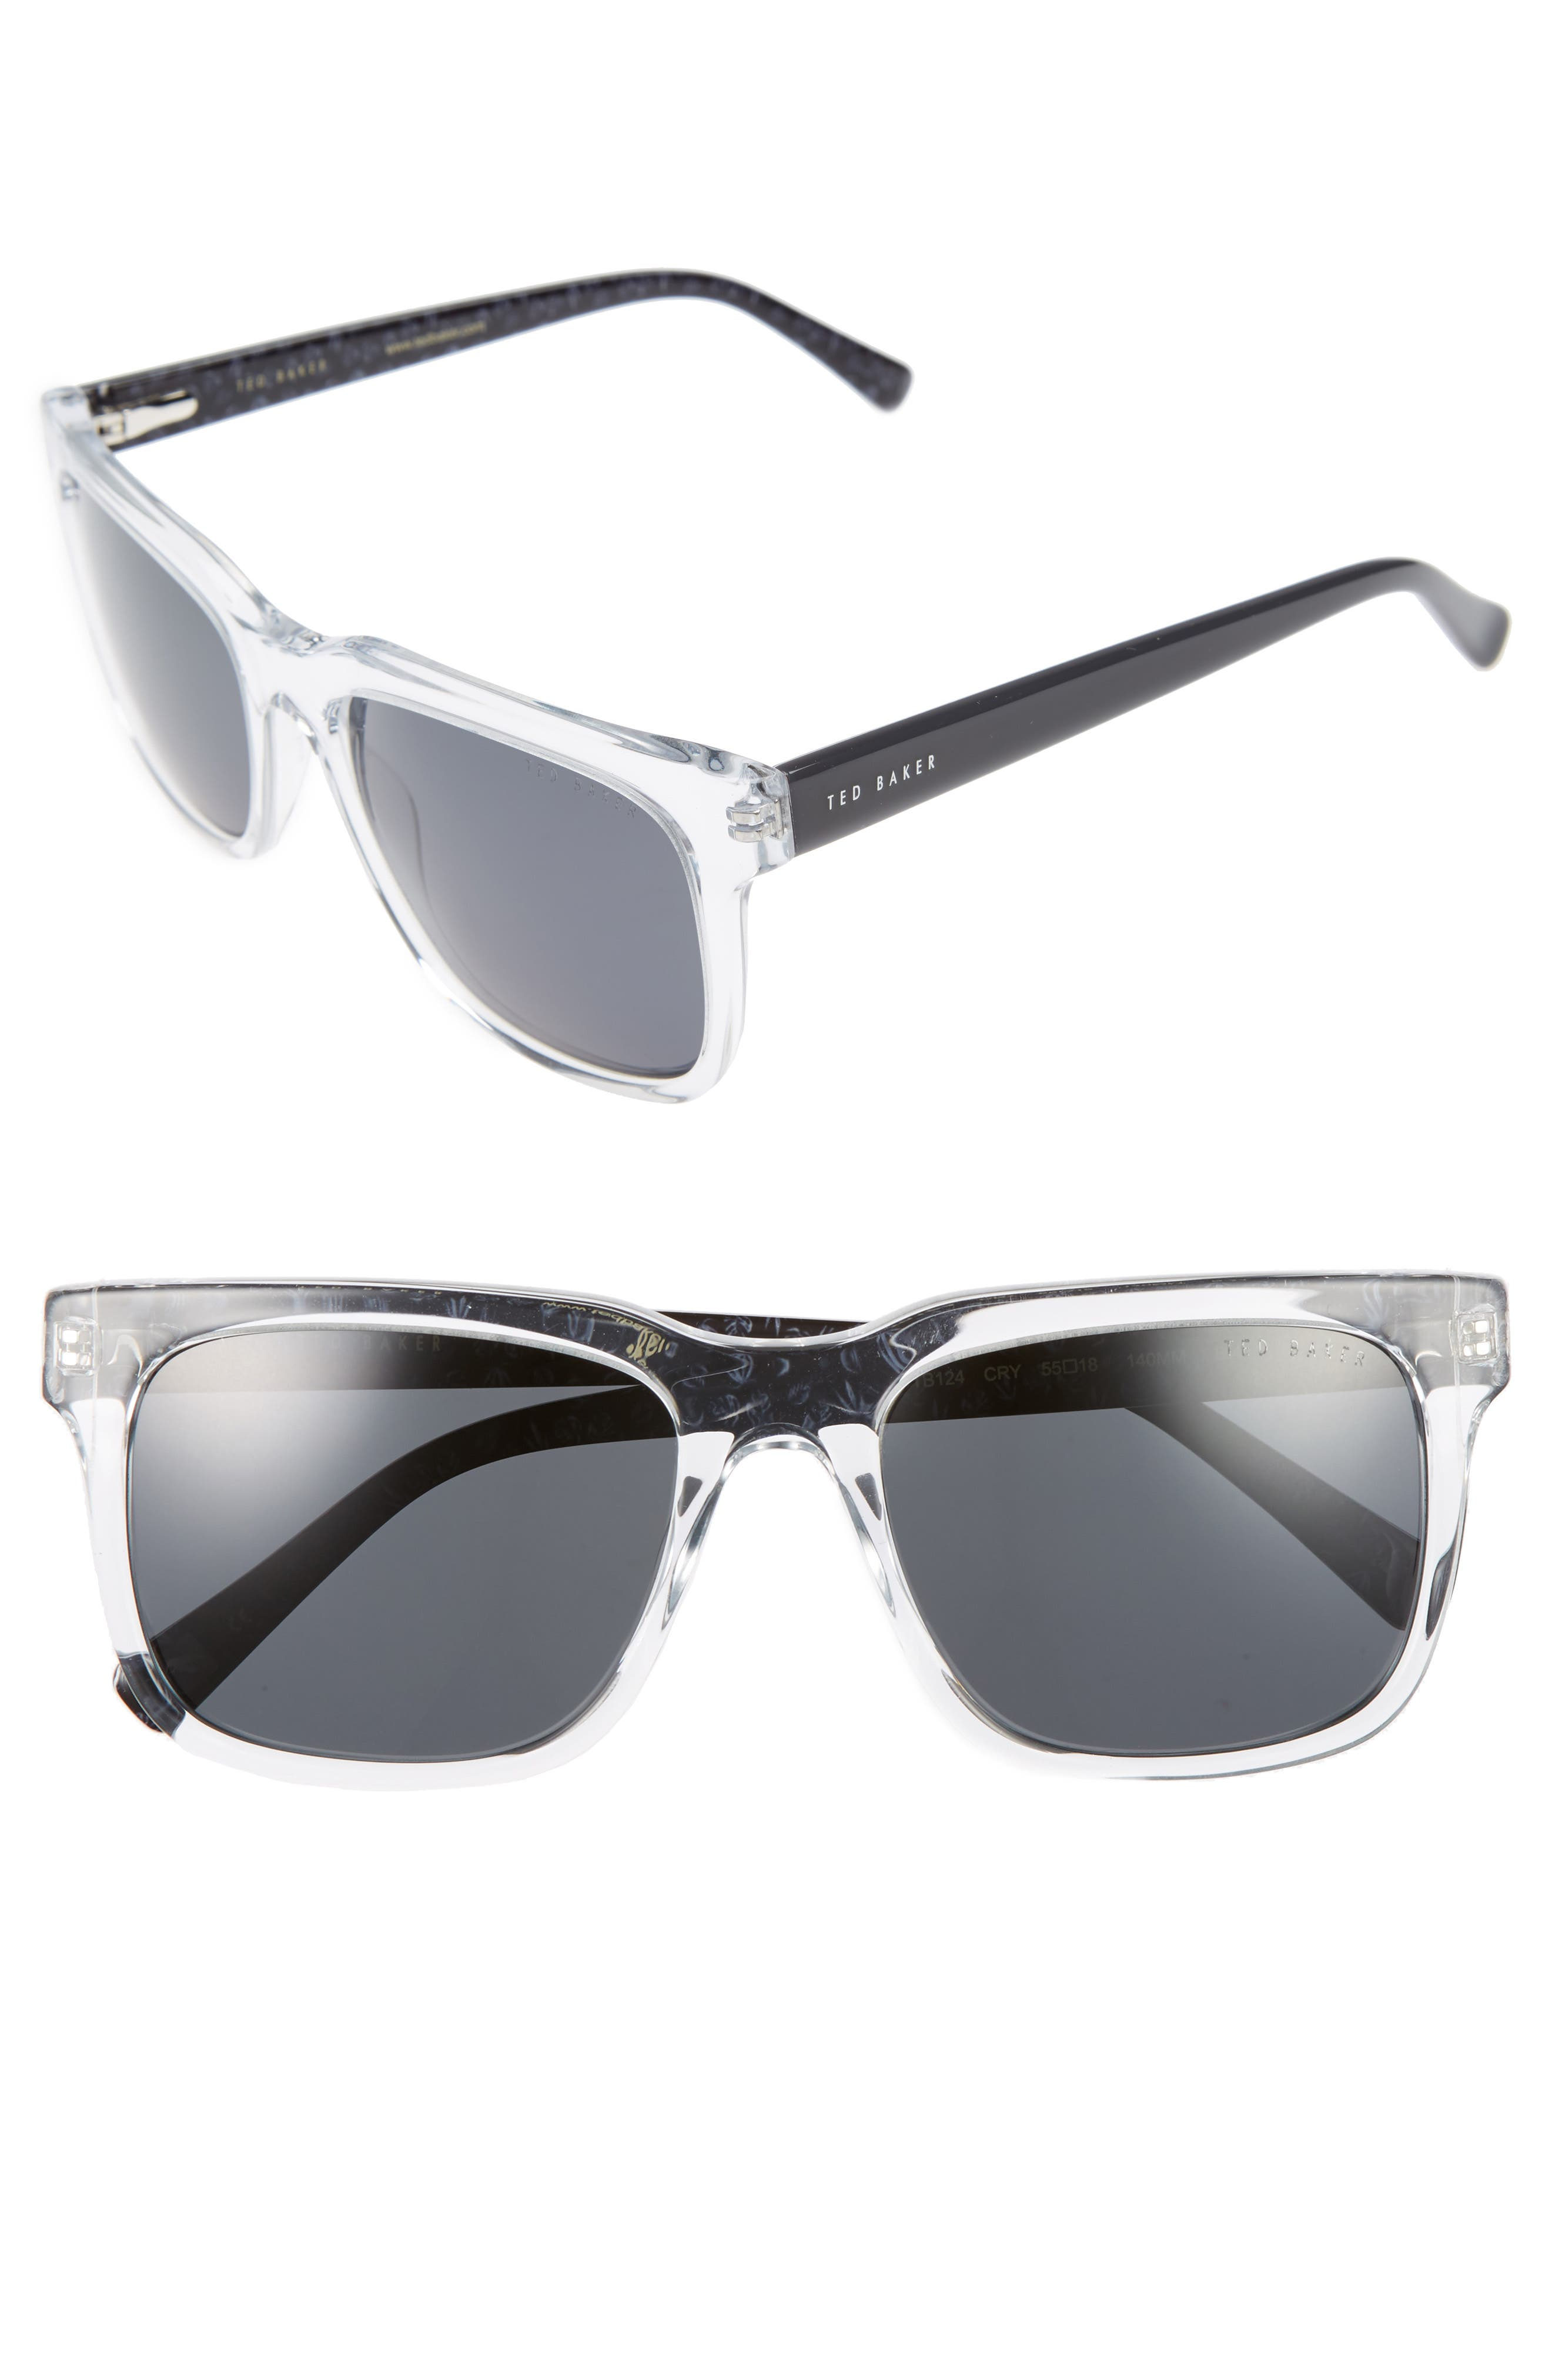 55mm Polarized Sunglasses,                         Main,                         color, Crystal